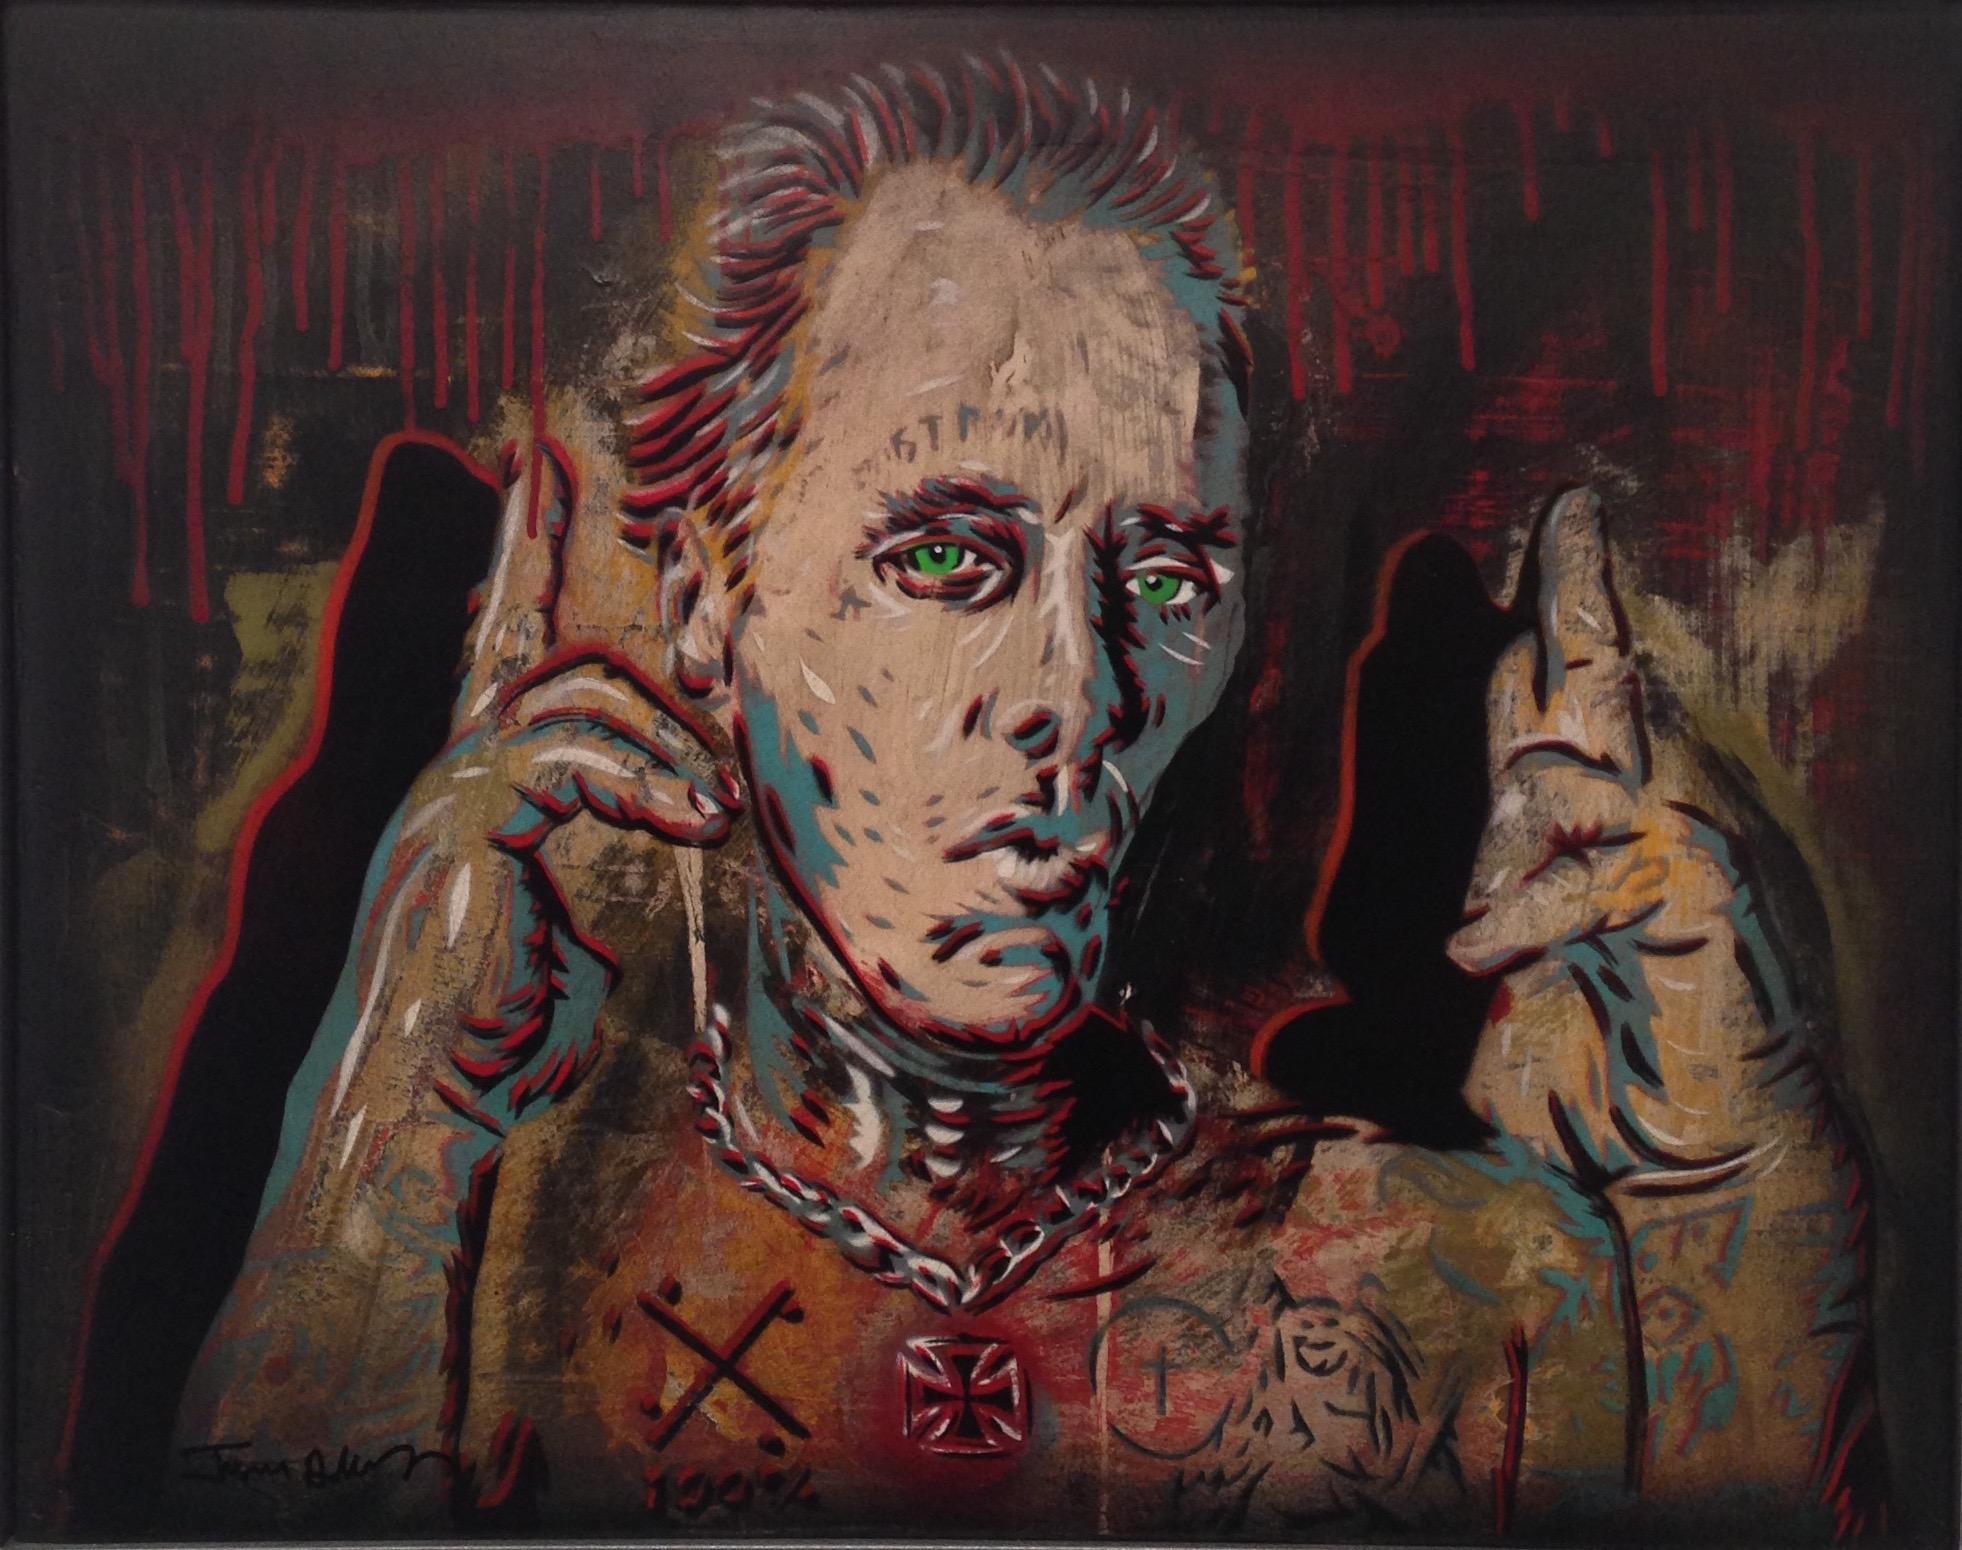 """JAY BOY"" 16""x20"" stencil, aerosol, latex paint on wood panel $600"